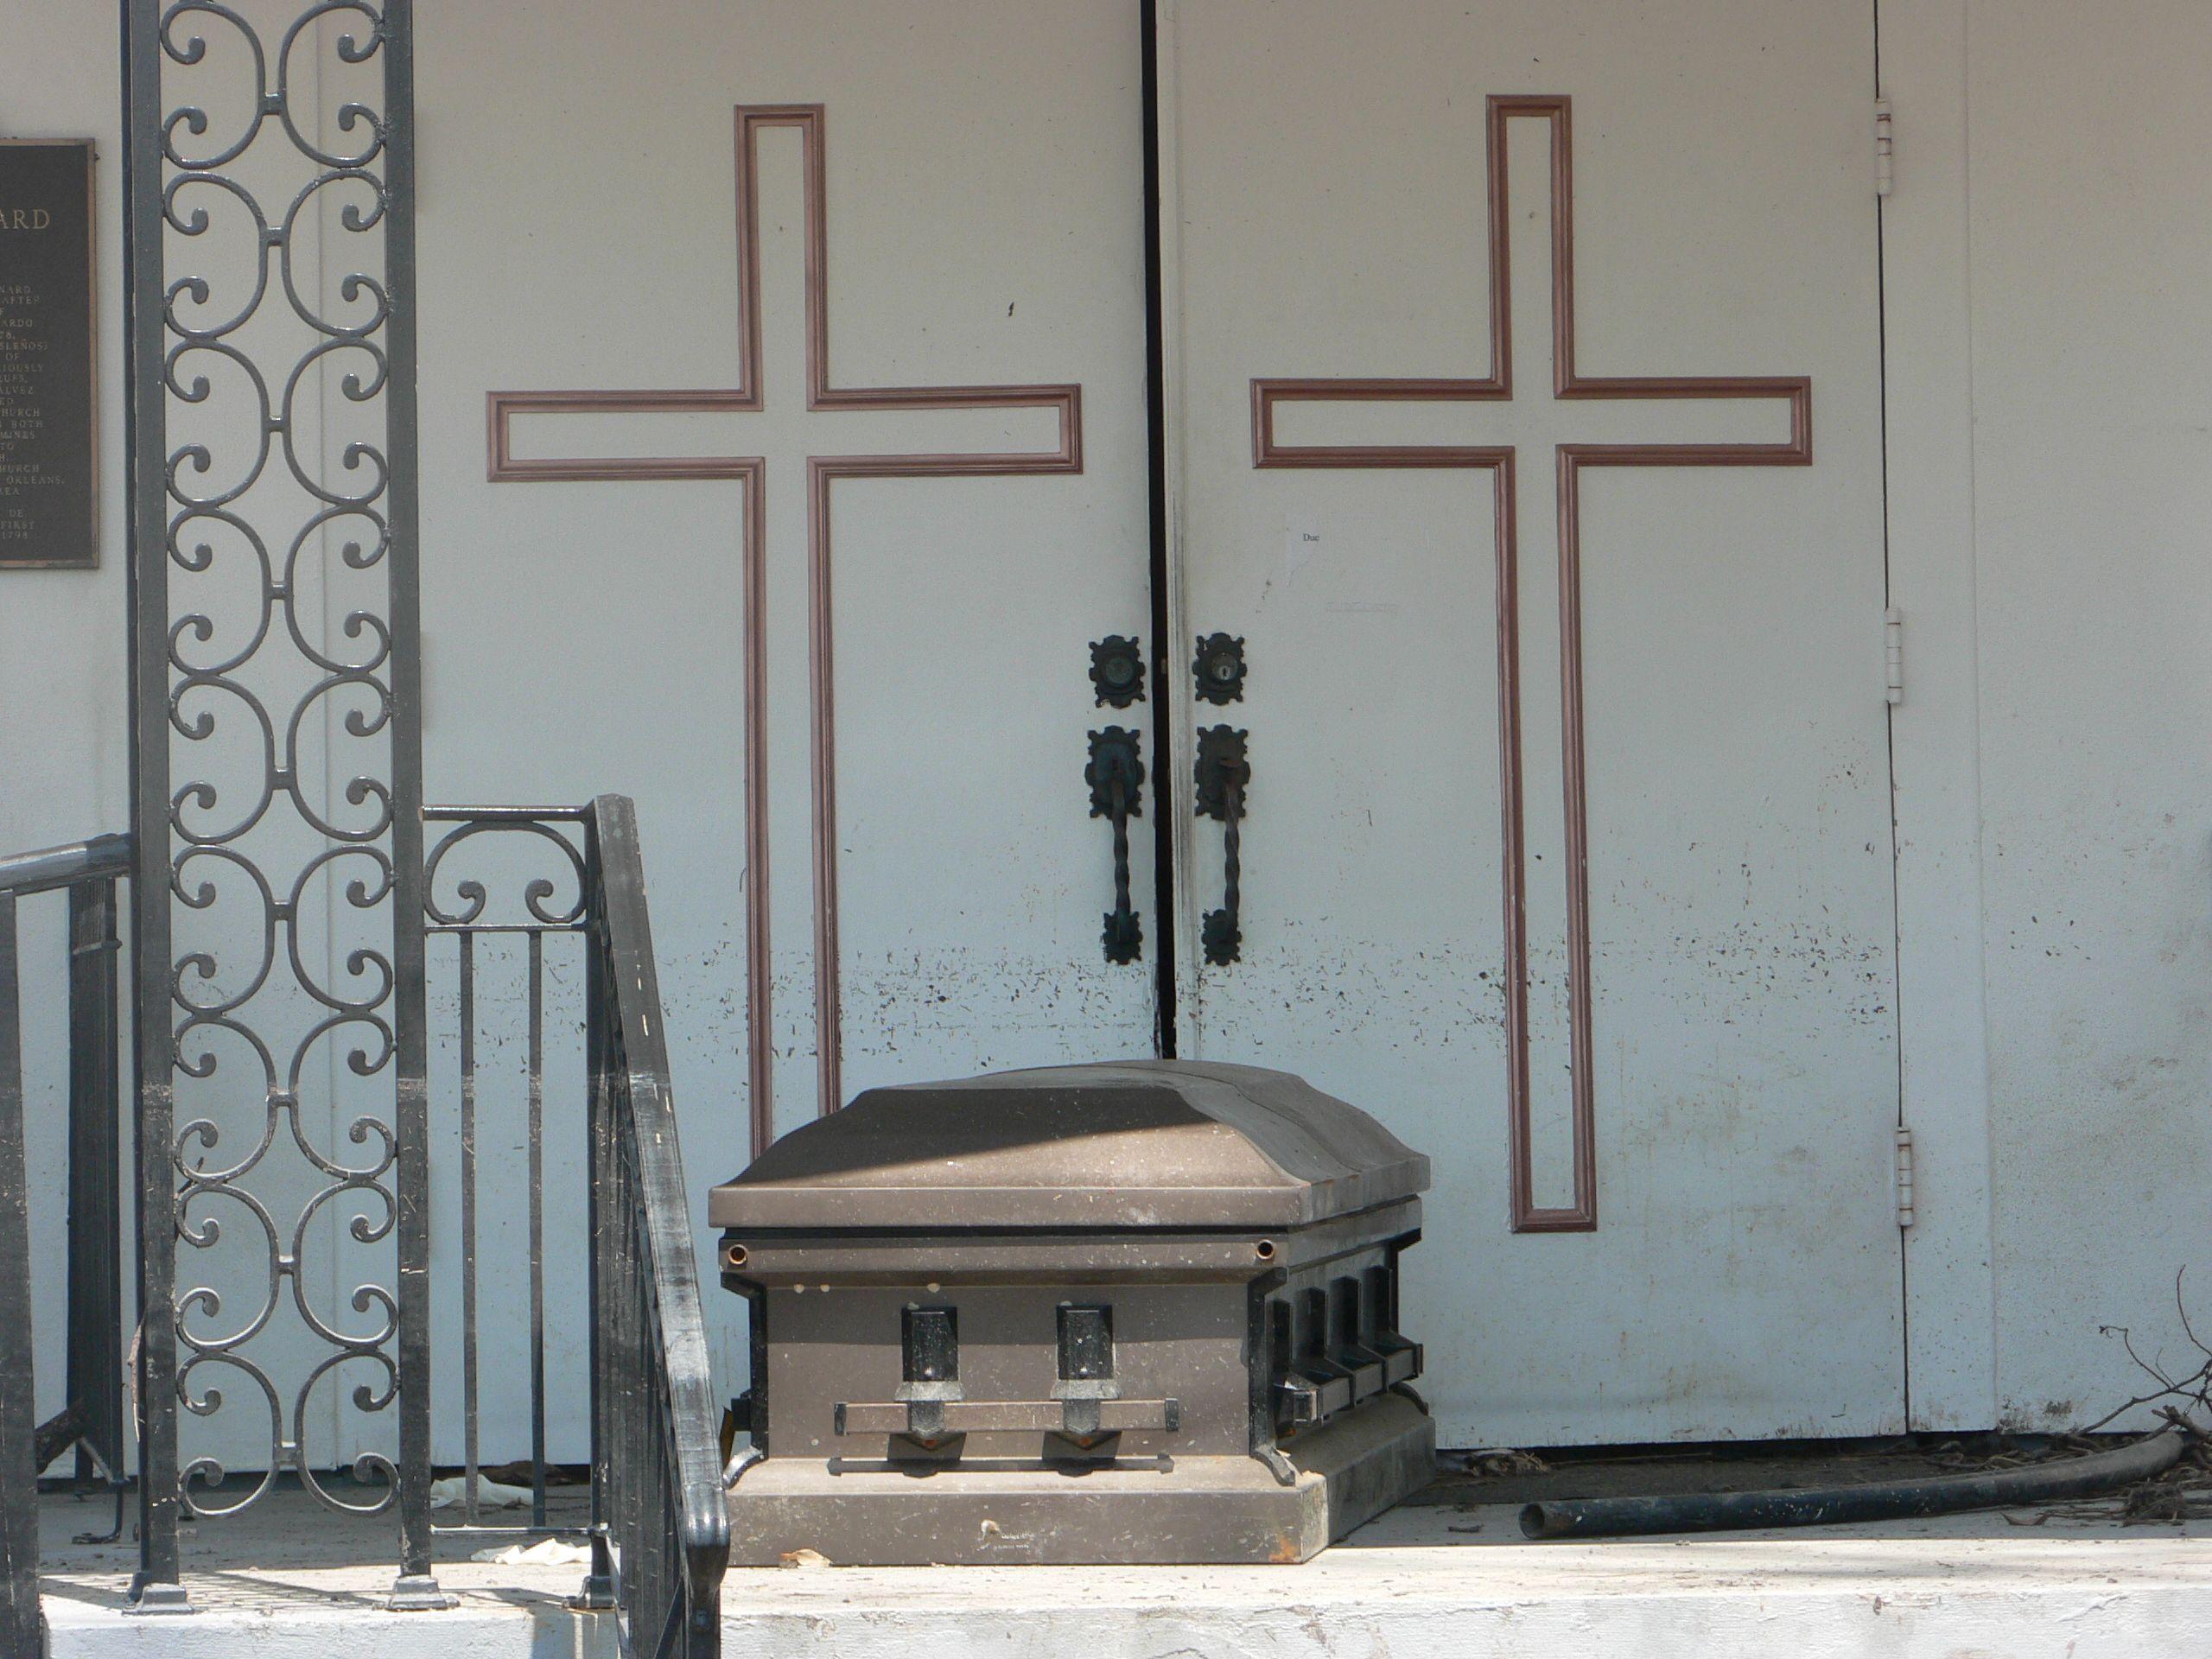 This was in St. Bernard parish a week after Katrina. St